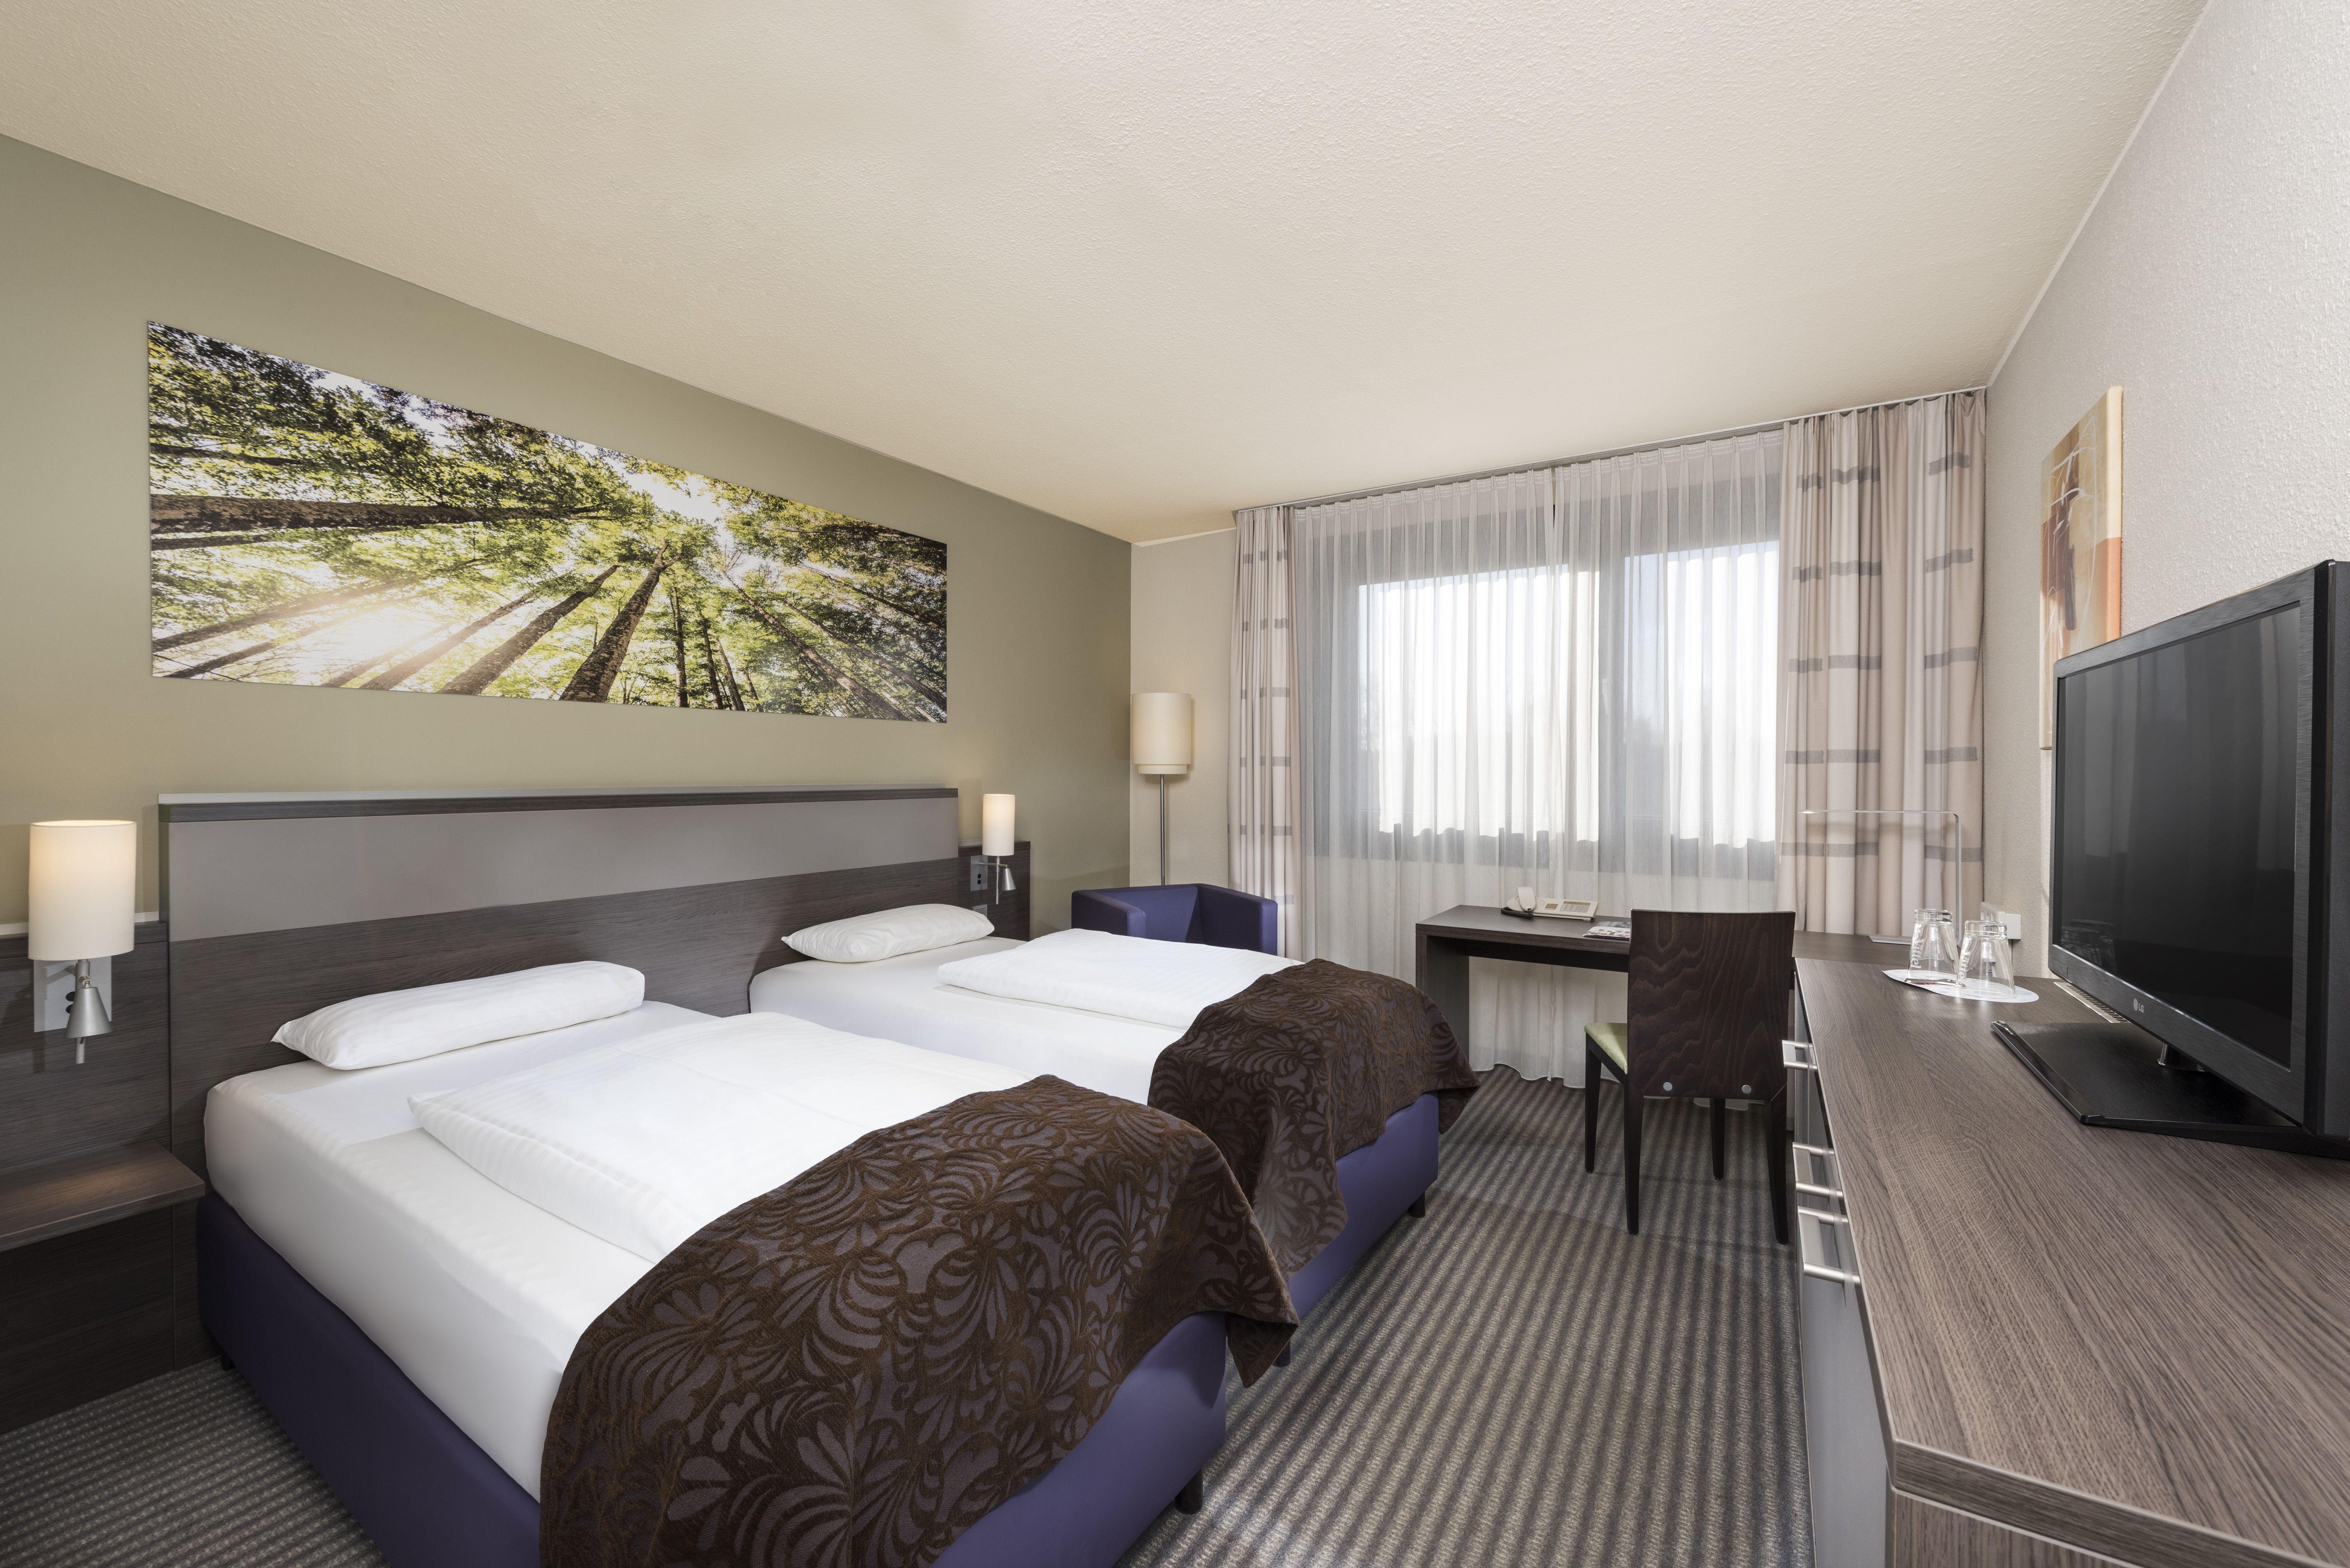 Mercure Hotel Düsseldorf Airport Hotel offers 120